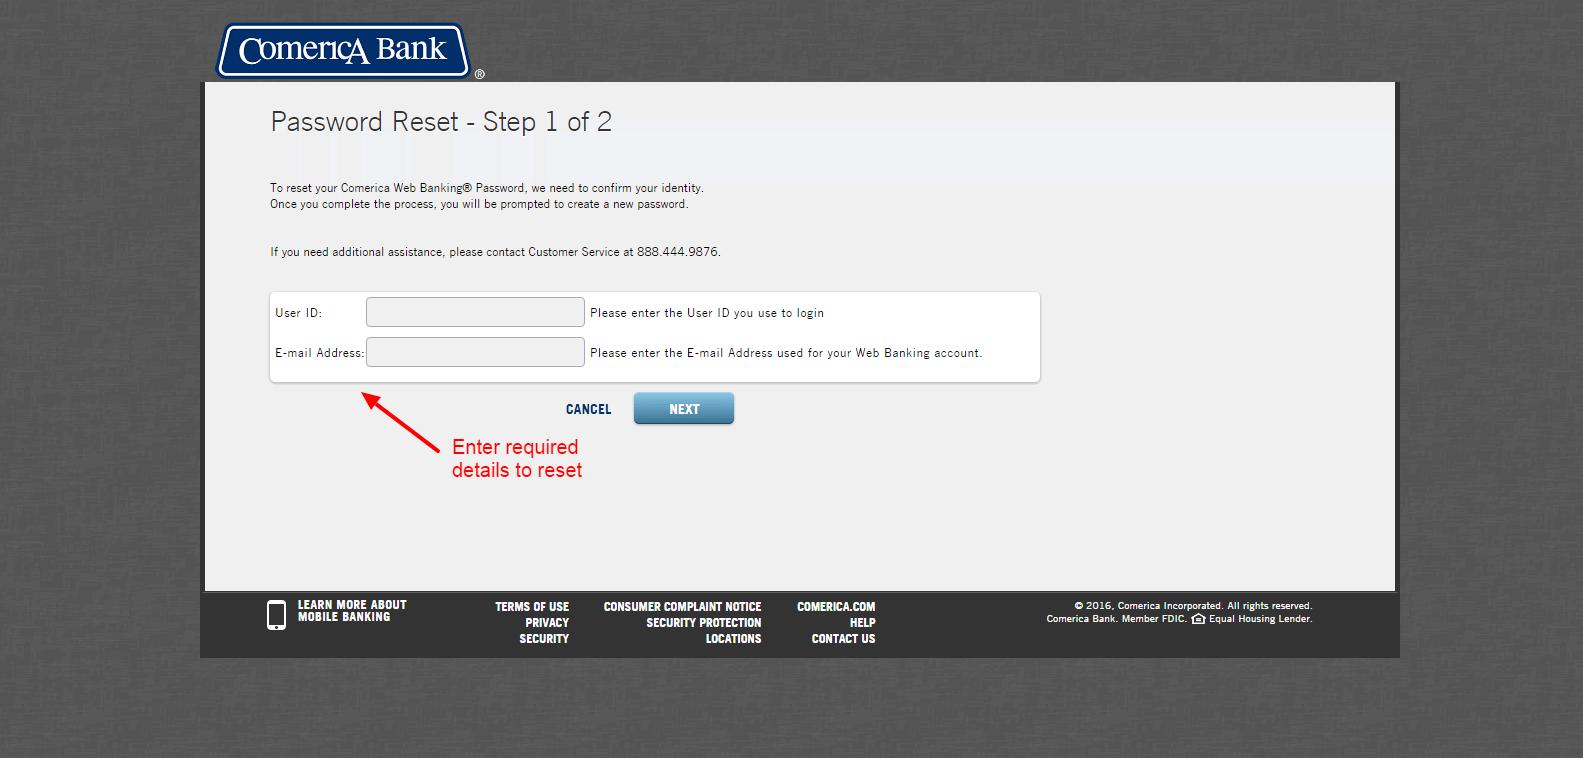 comerica customer service number